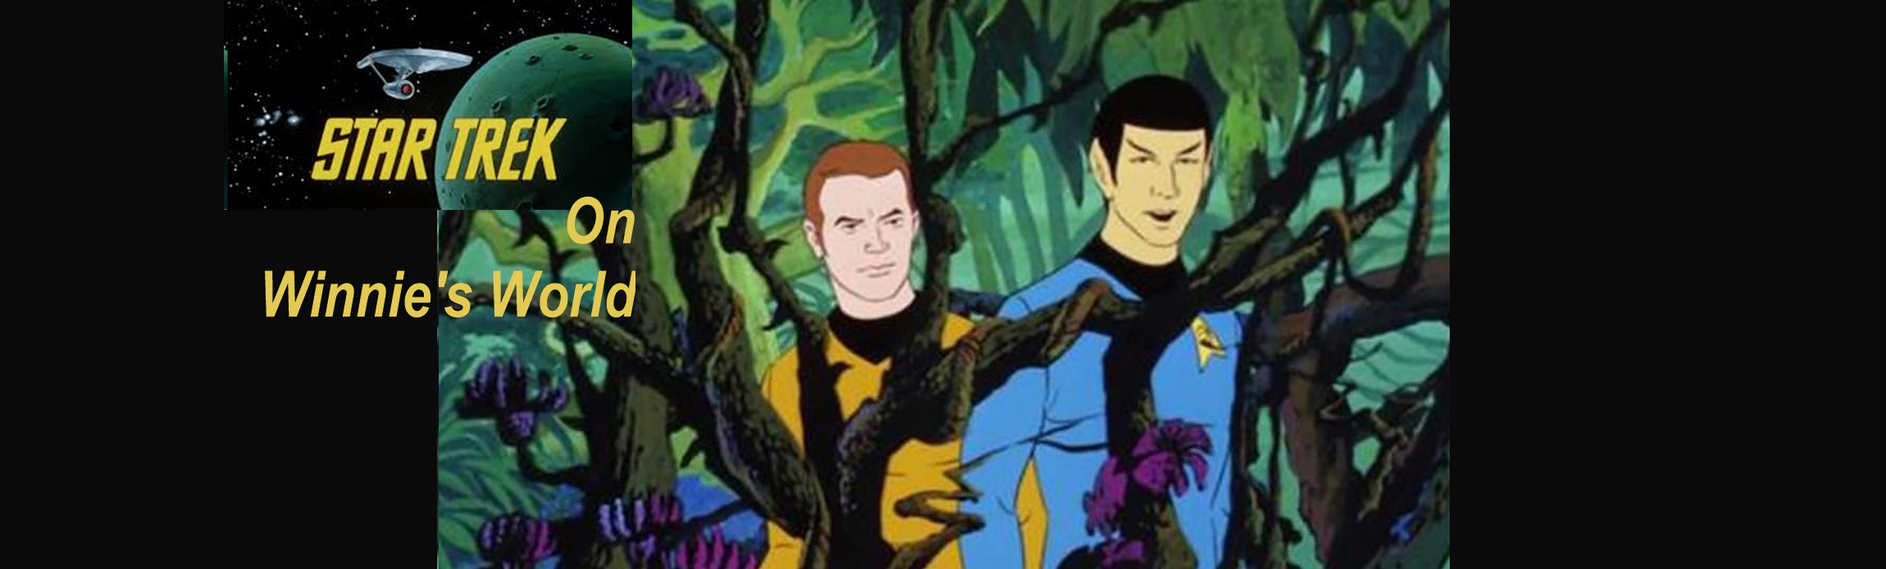 Star Trek 2 on Winnies World.png